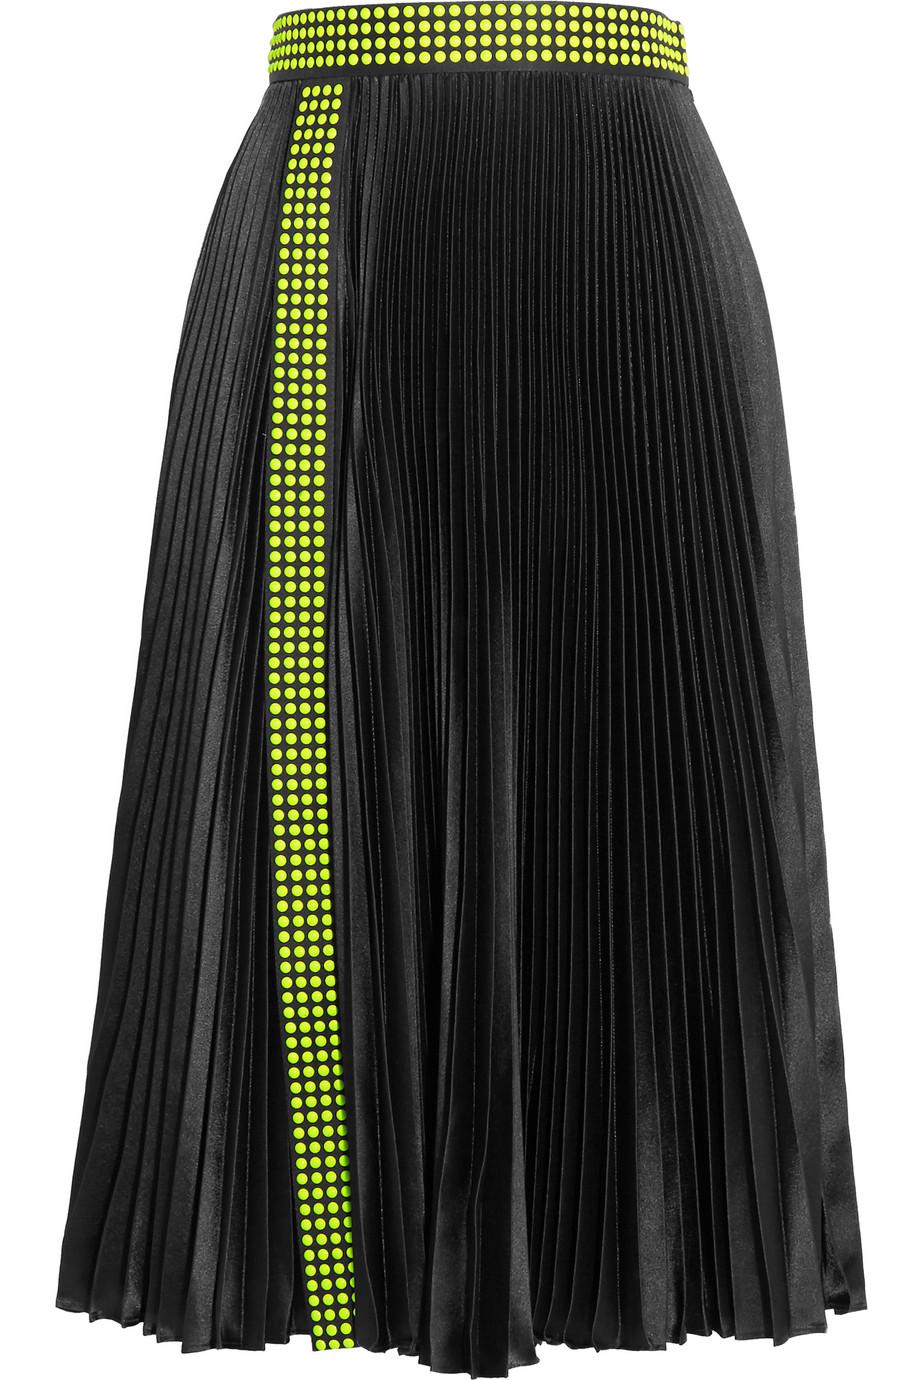 Studded Pleated Satin Skirt, Christopher Kane, Size: 44